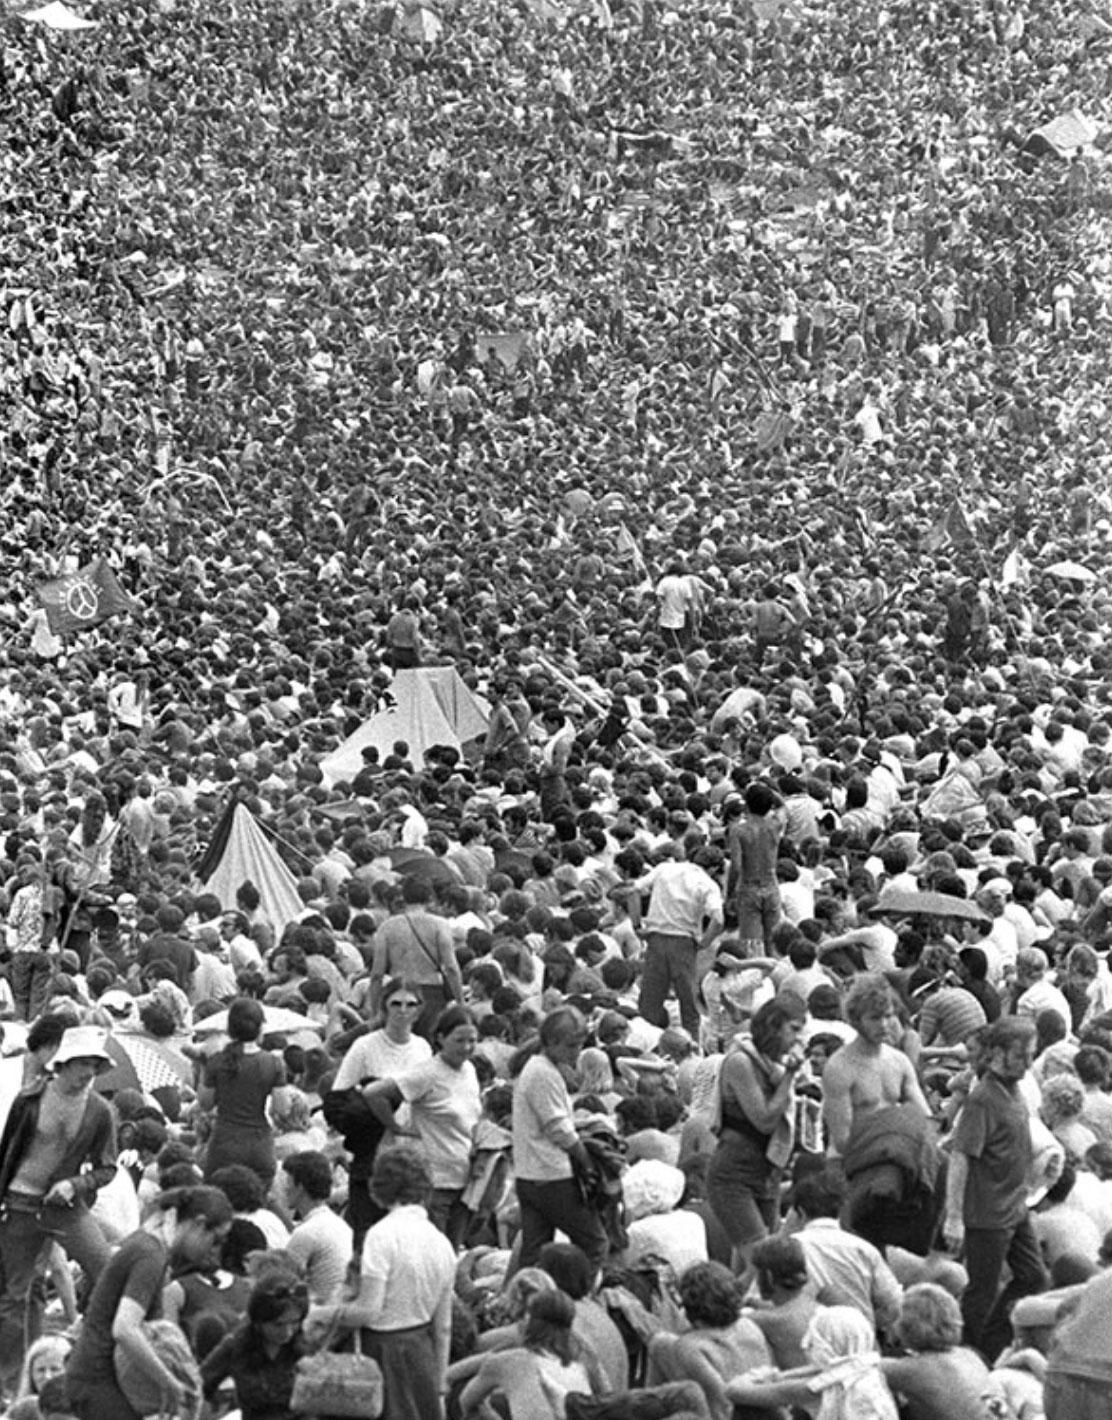 Woodstock 1969, Crowd View